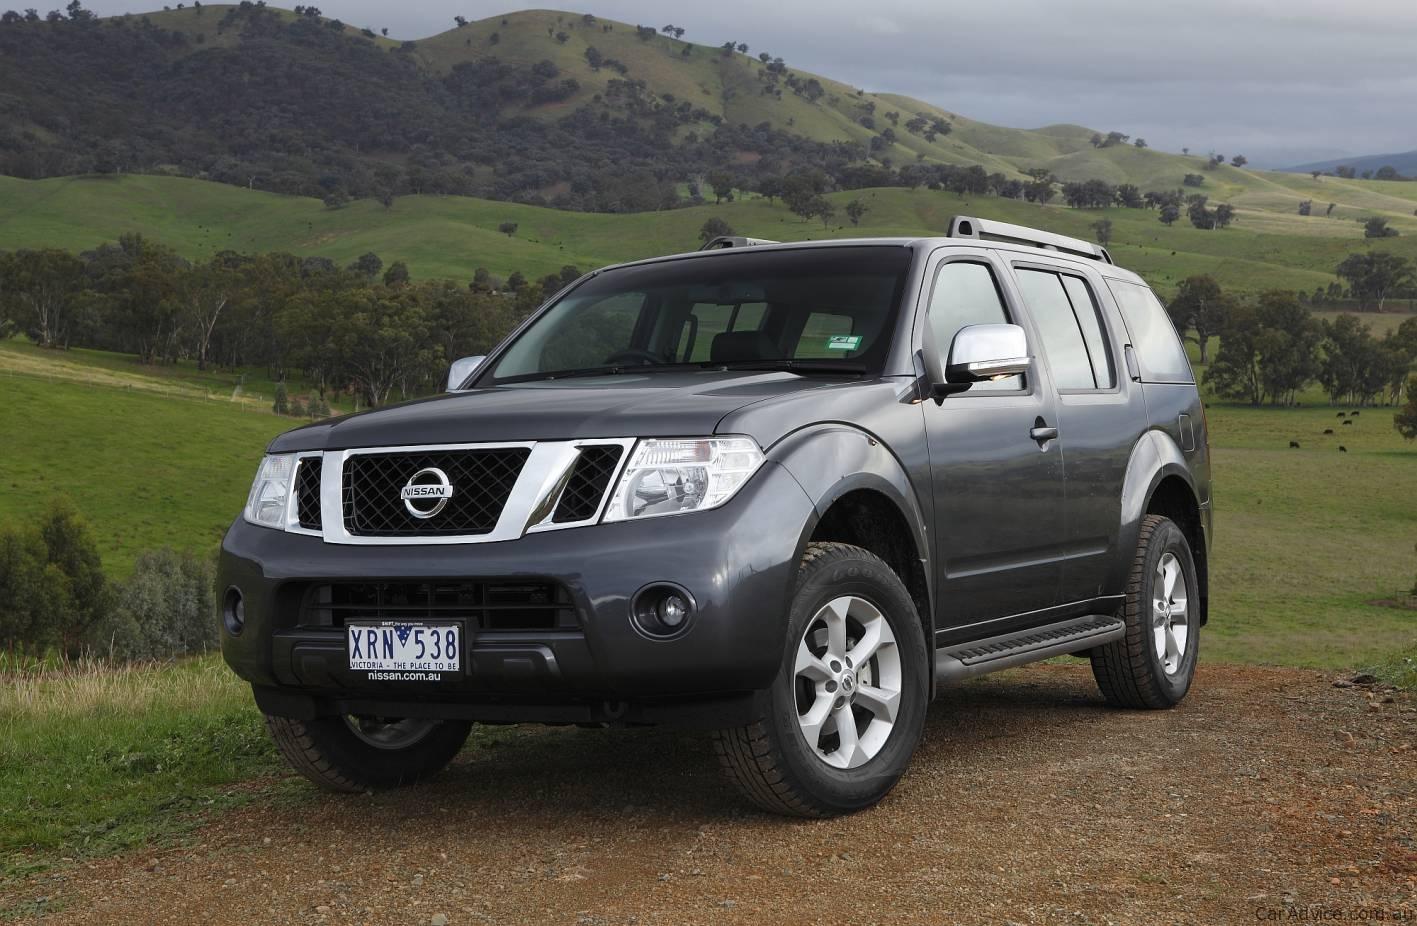 2010 Nissan Pathfinder Range Revised - Photos